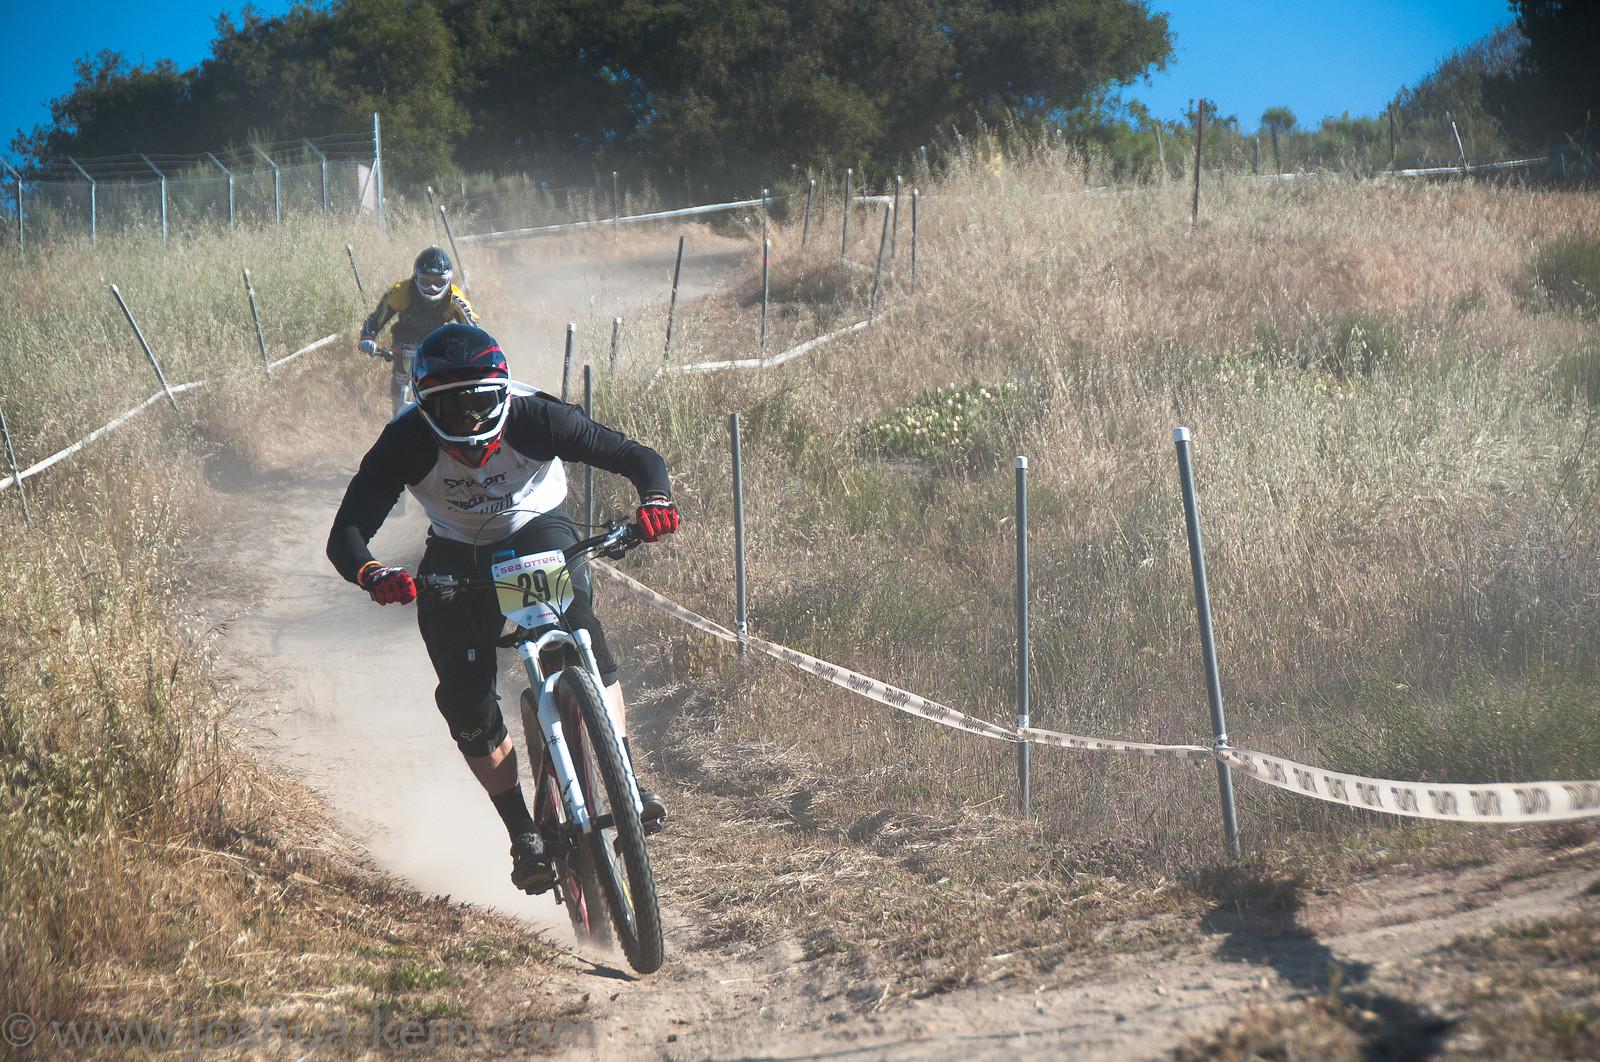 4-19-13DHPractice (10 of 36) - jkern620 - Mountain Biking Pictures - Vital MTB